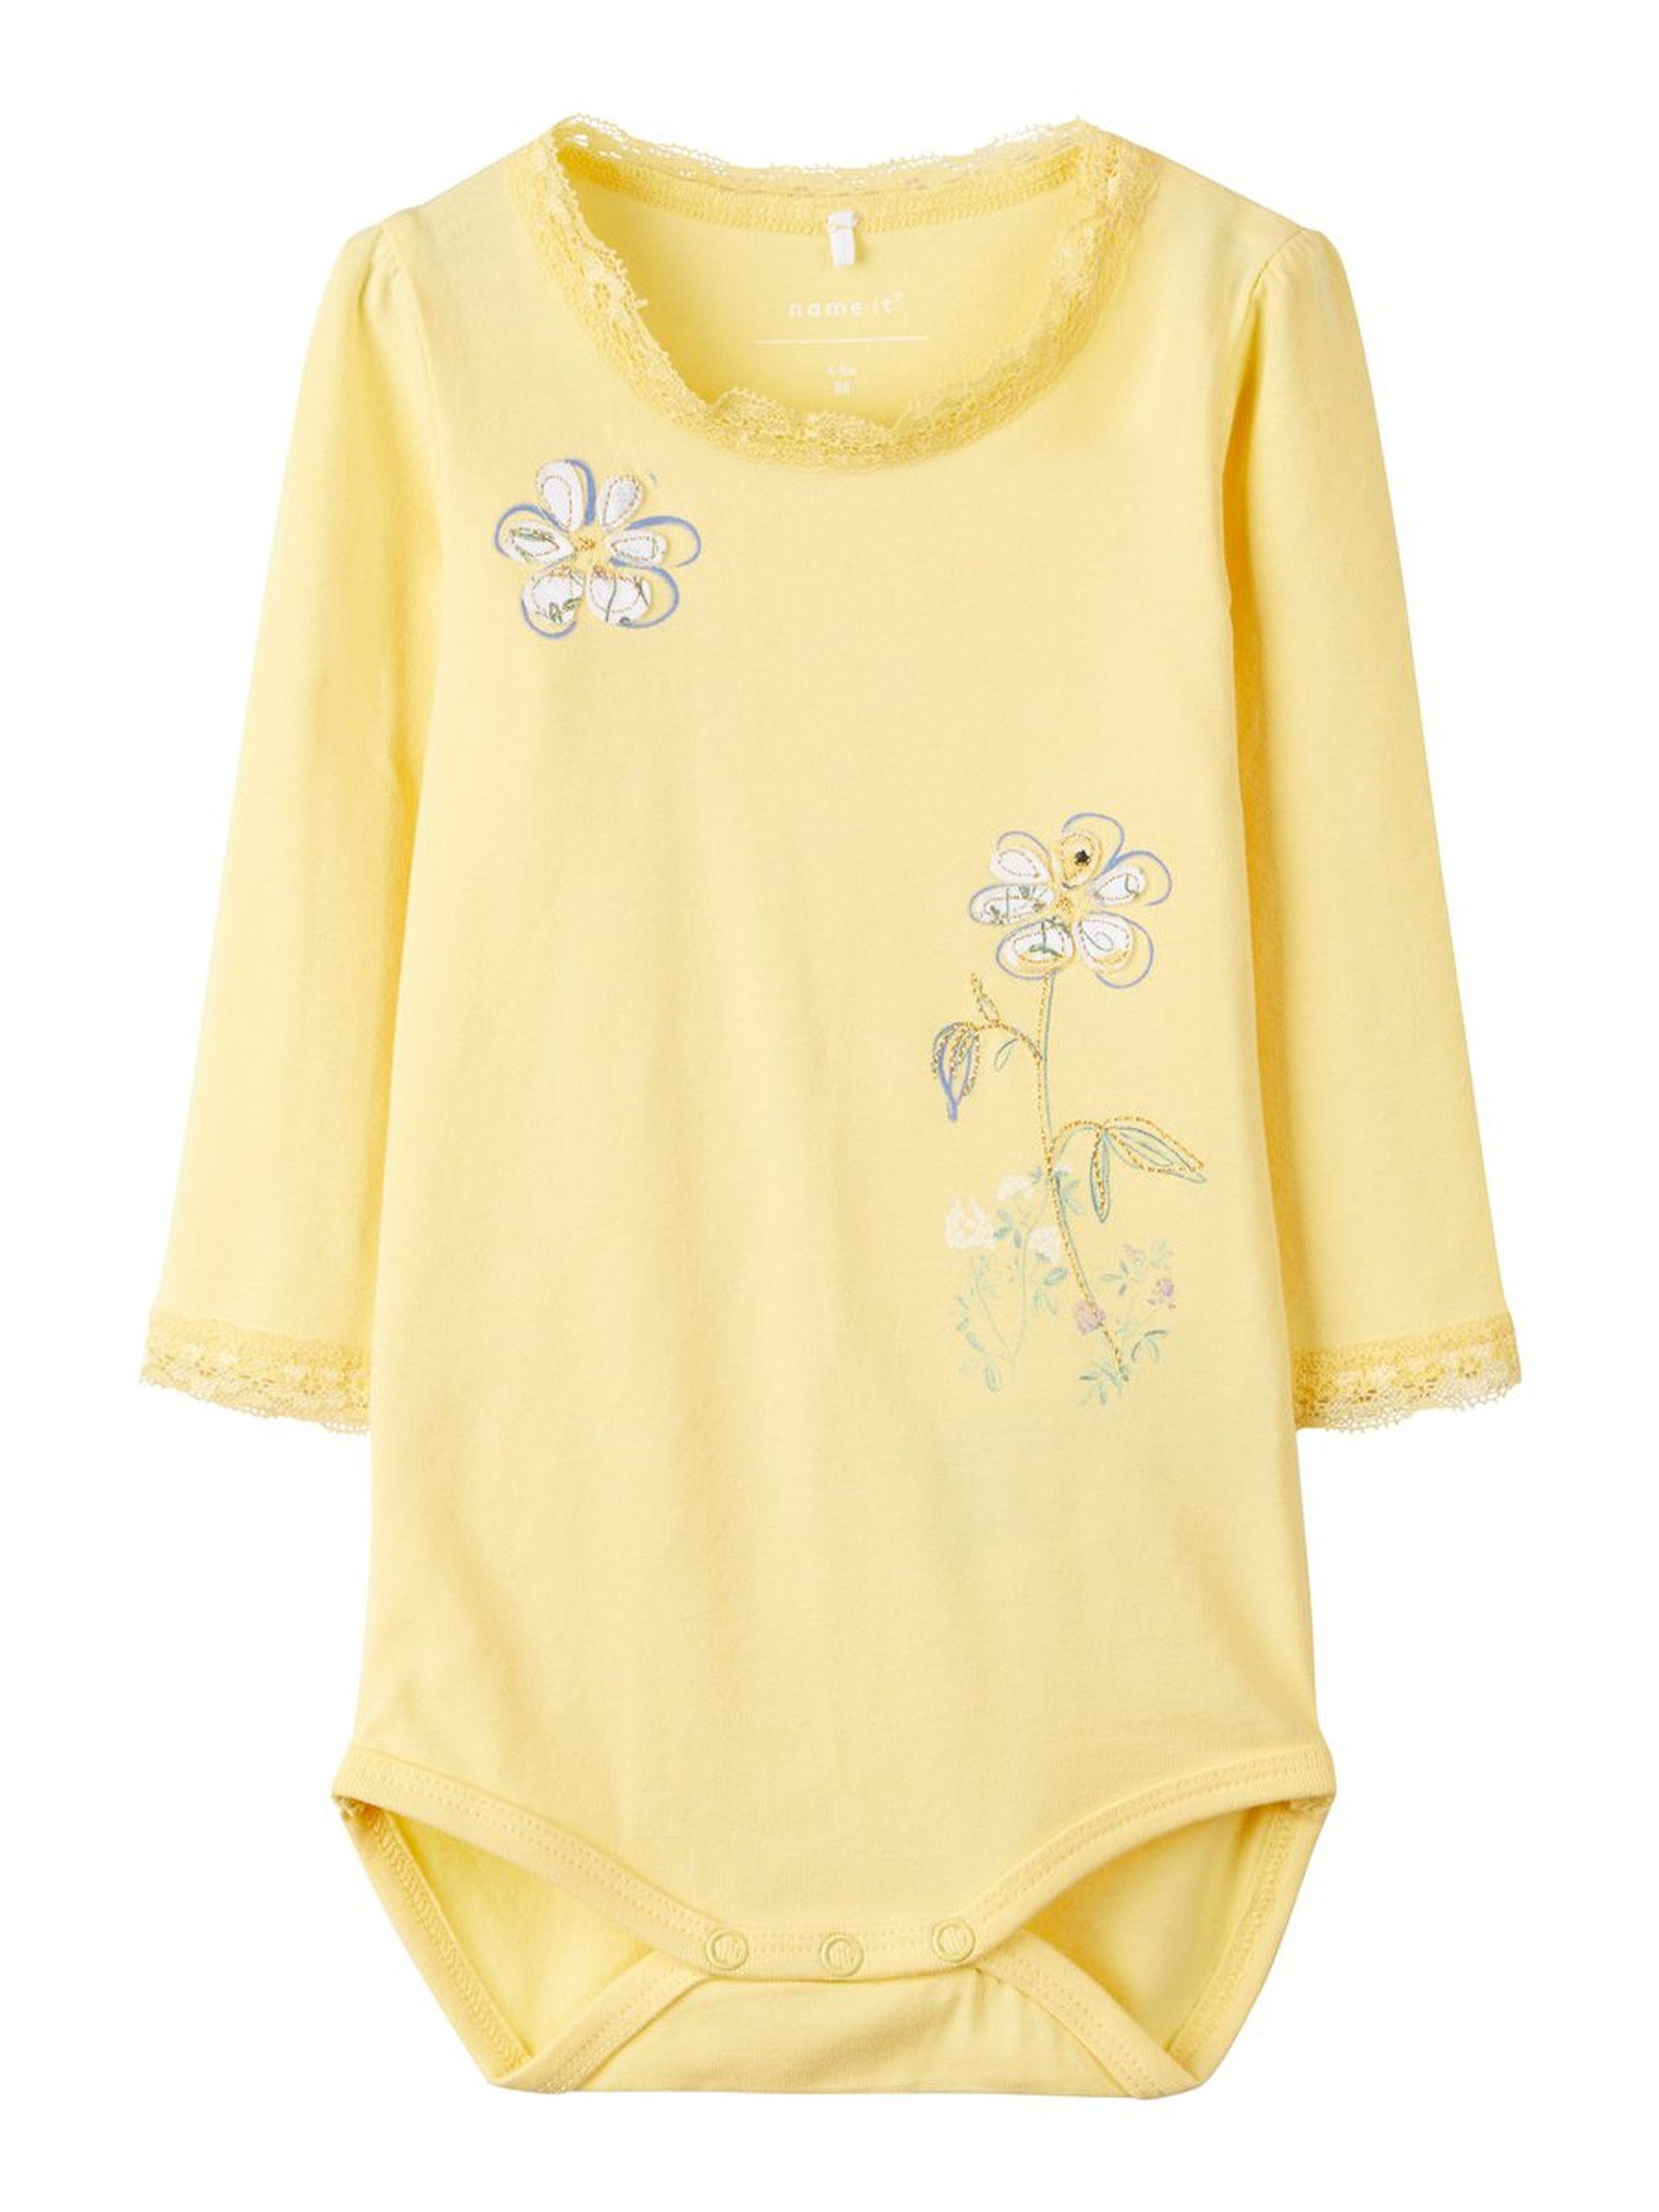 9d77f7d5cd10 Gul body til baby – Name It gul body med broderier – Mio Trend